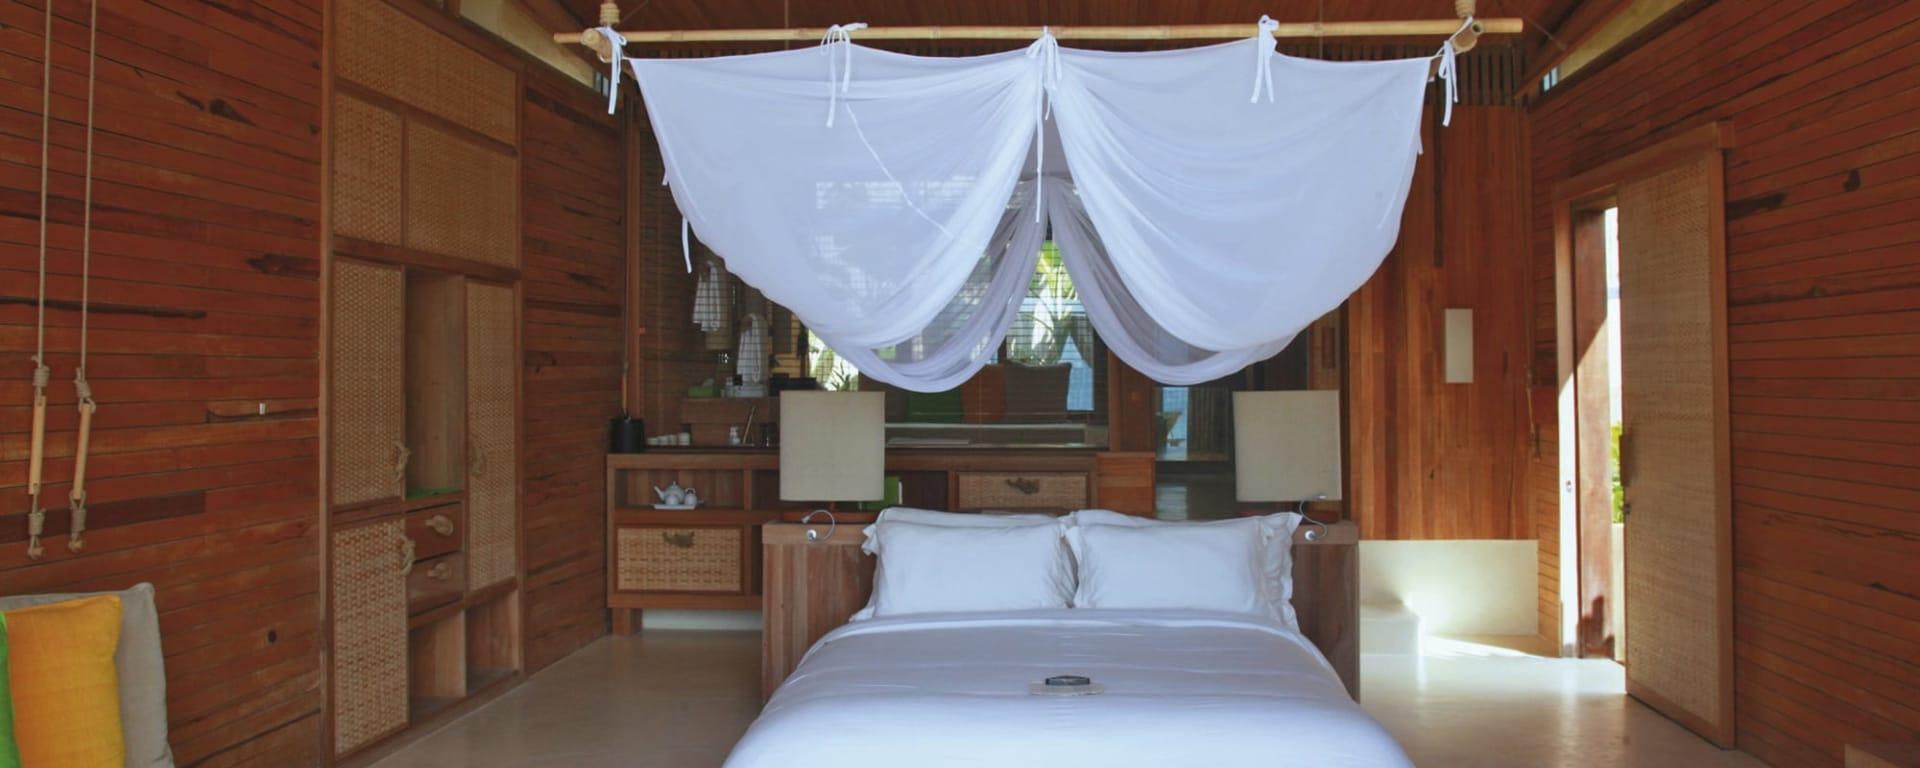 Six Senses Con Dao in Saigon: Vietnam Six Senses Con Dao Oceanfront Villa